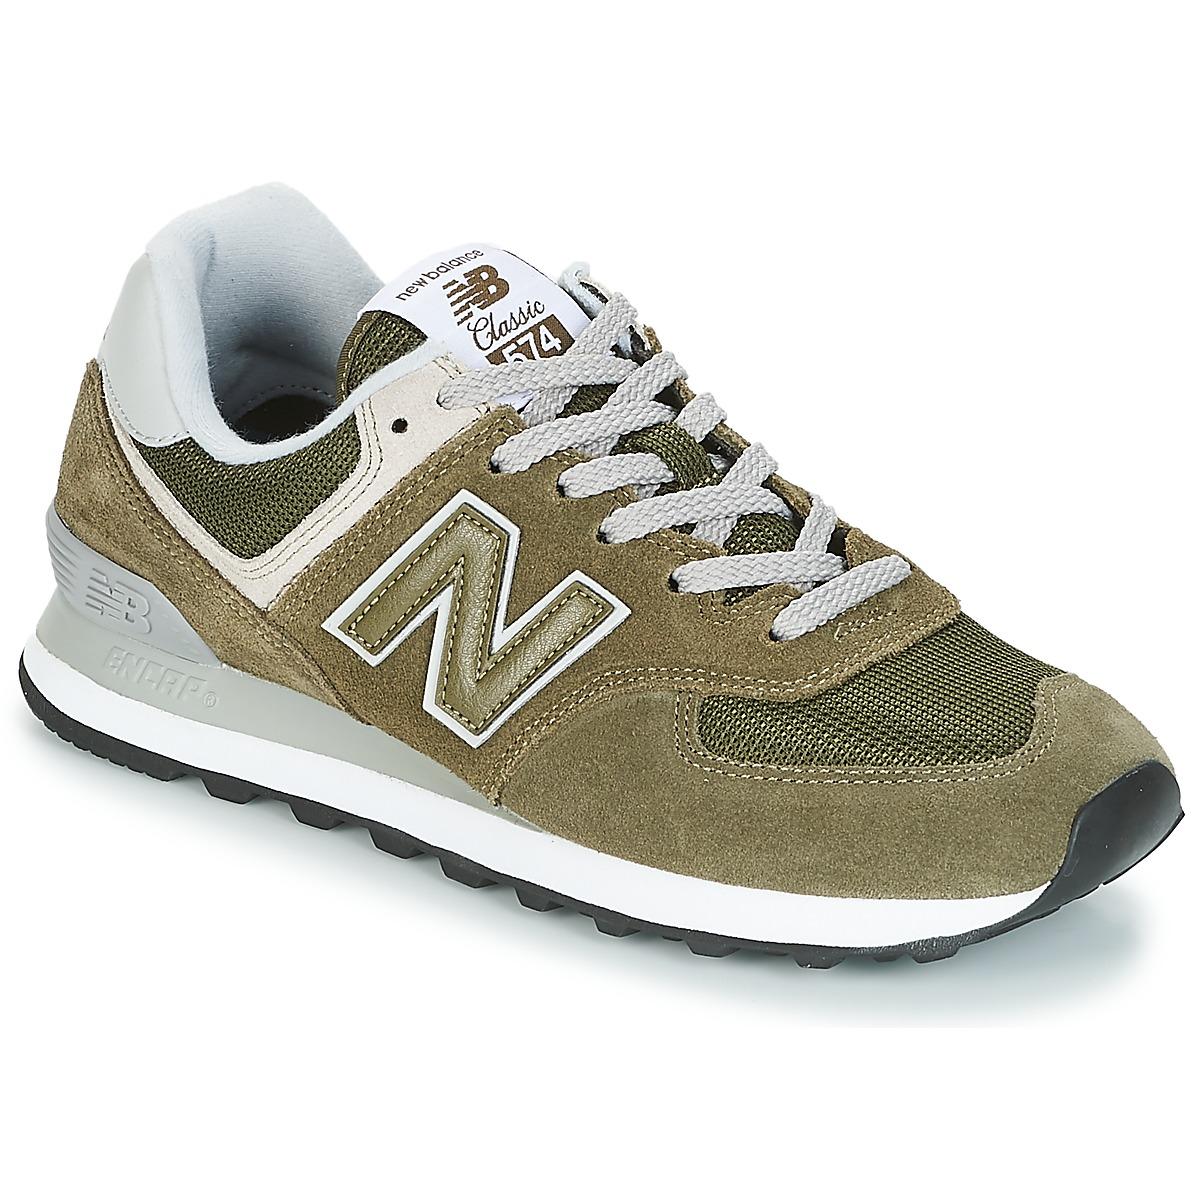 New Balance ML574 Olive - Kostenloser Versand bei Spartoode ! - Schuhe Sneaker Low  79,99 €